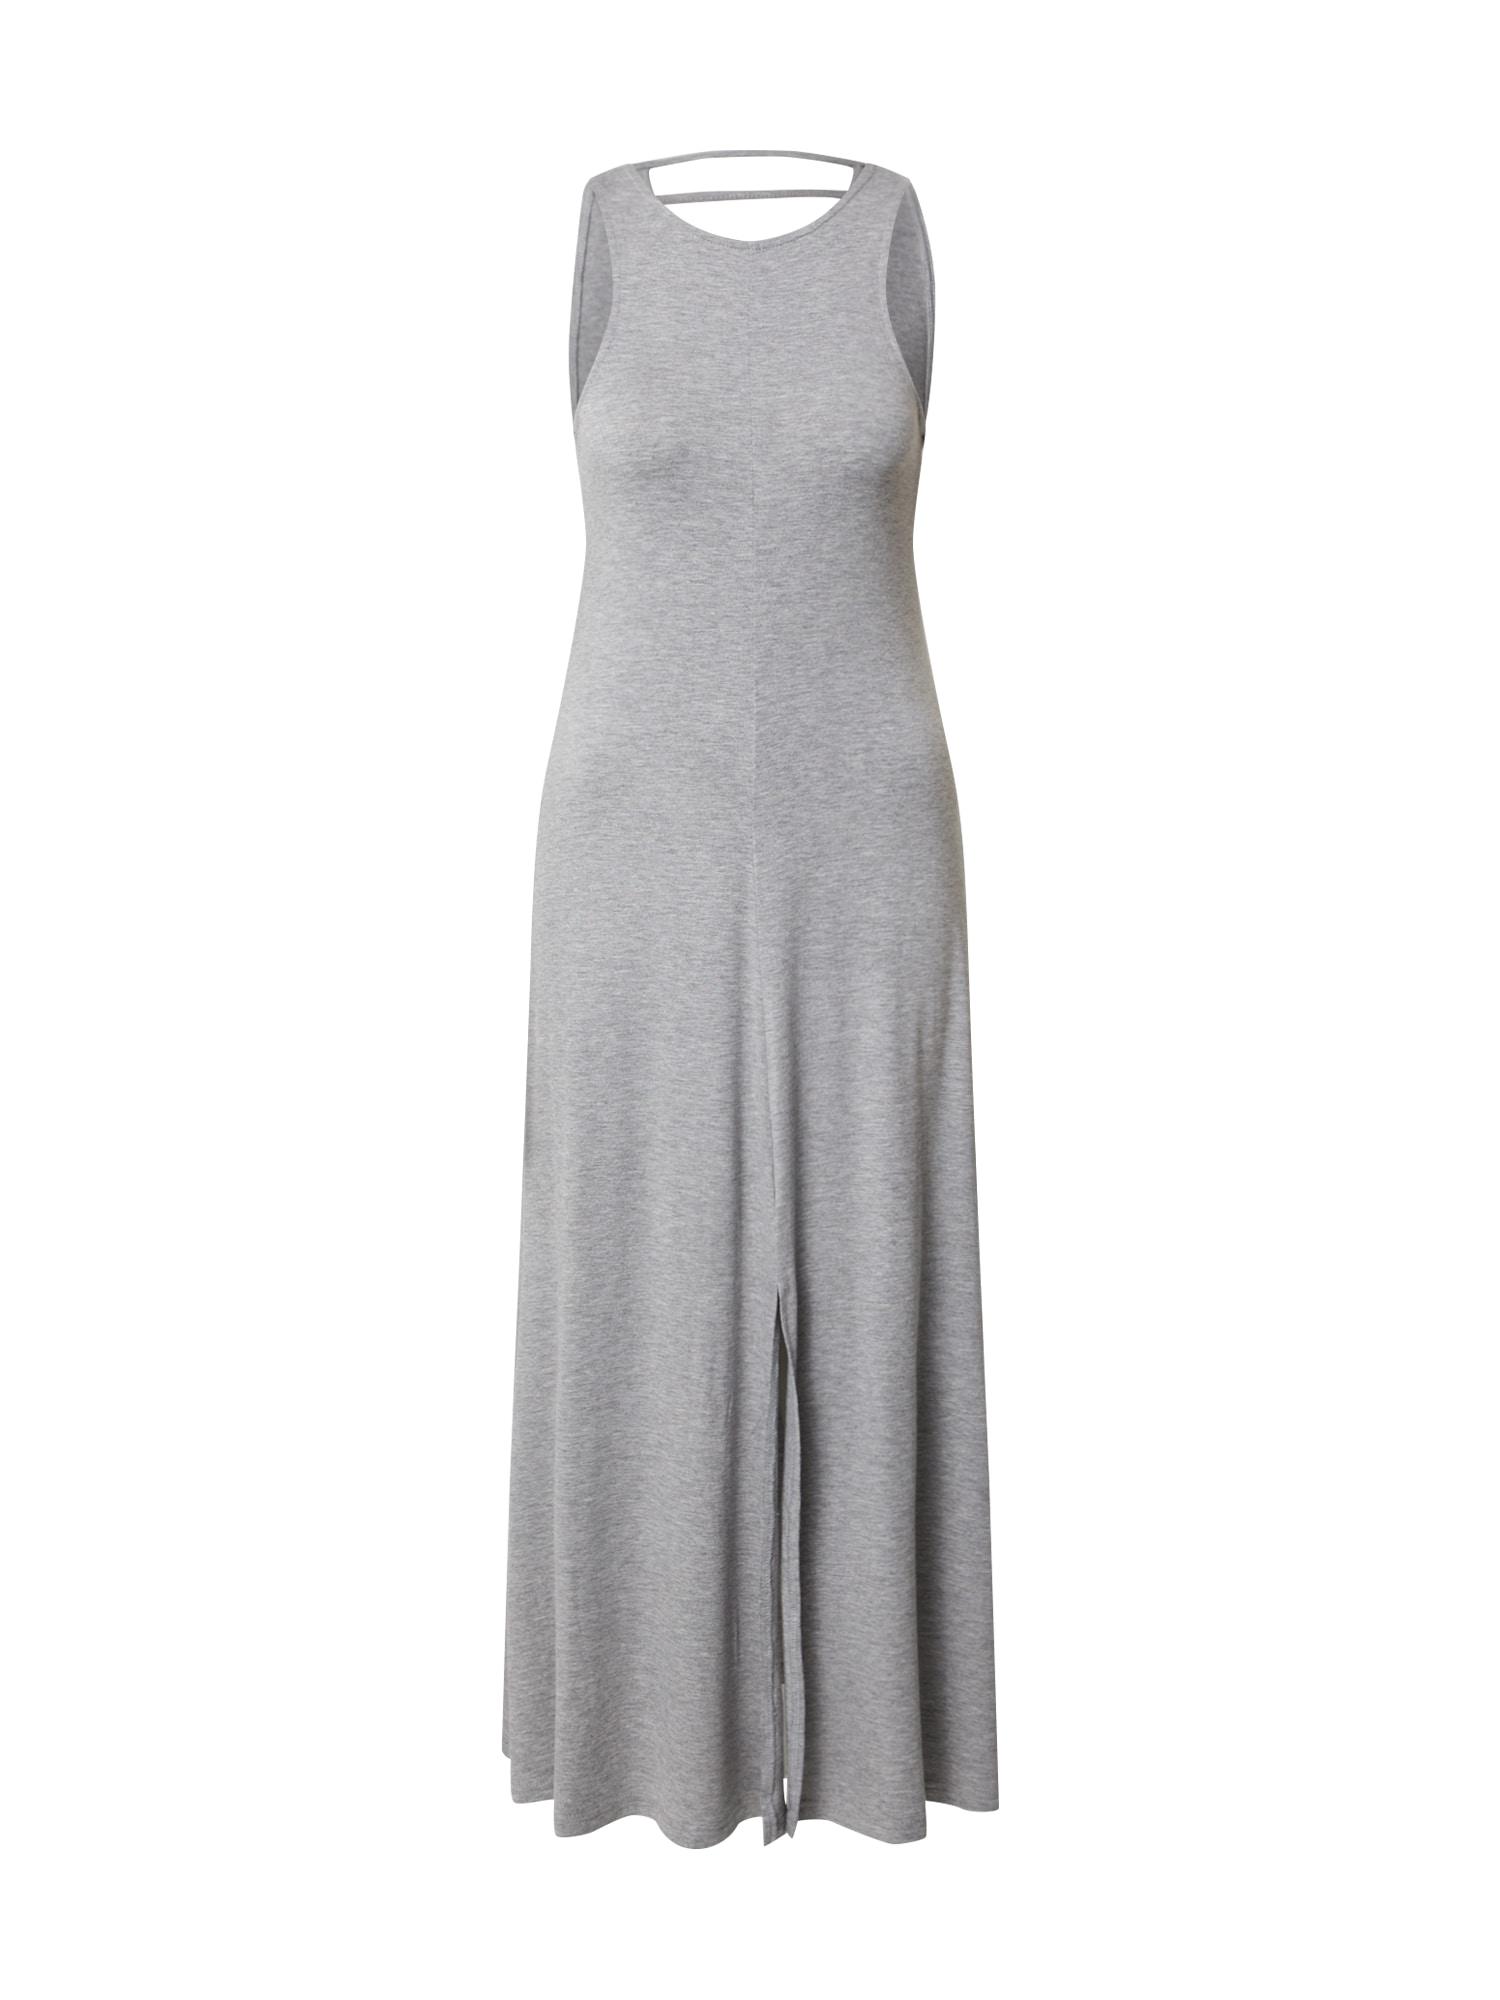 Noisy May Šaty  šedá / šedý melír